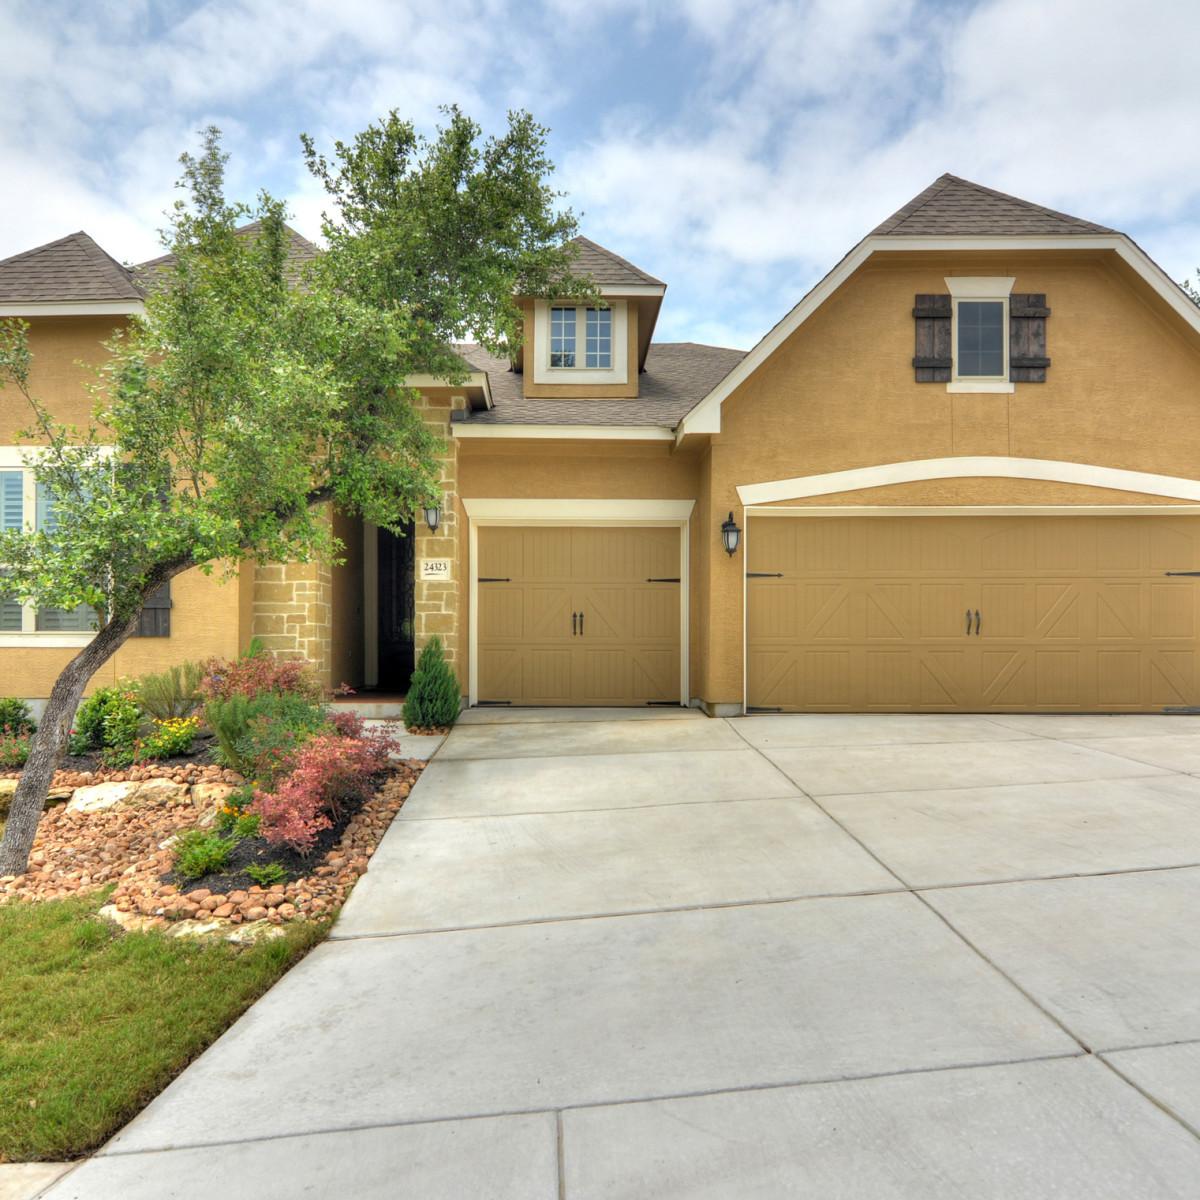 24323 Arboles Verdes San Antonio house for sale